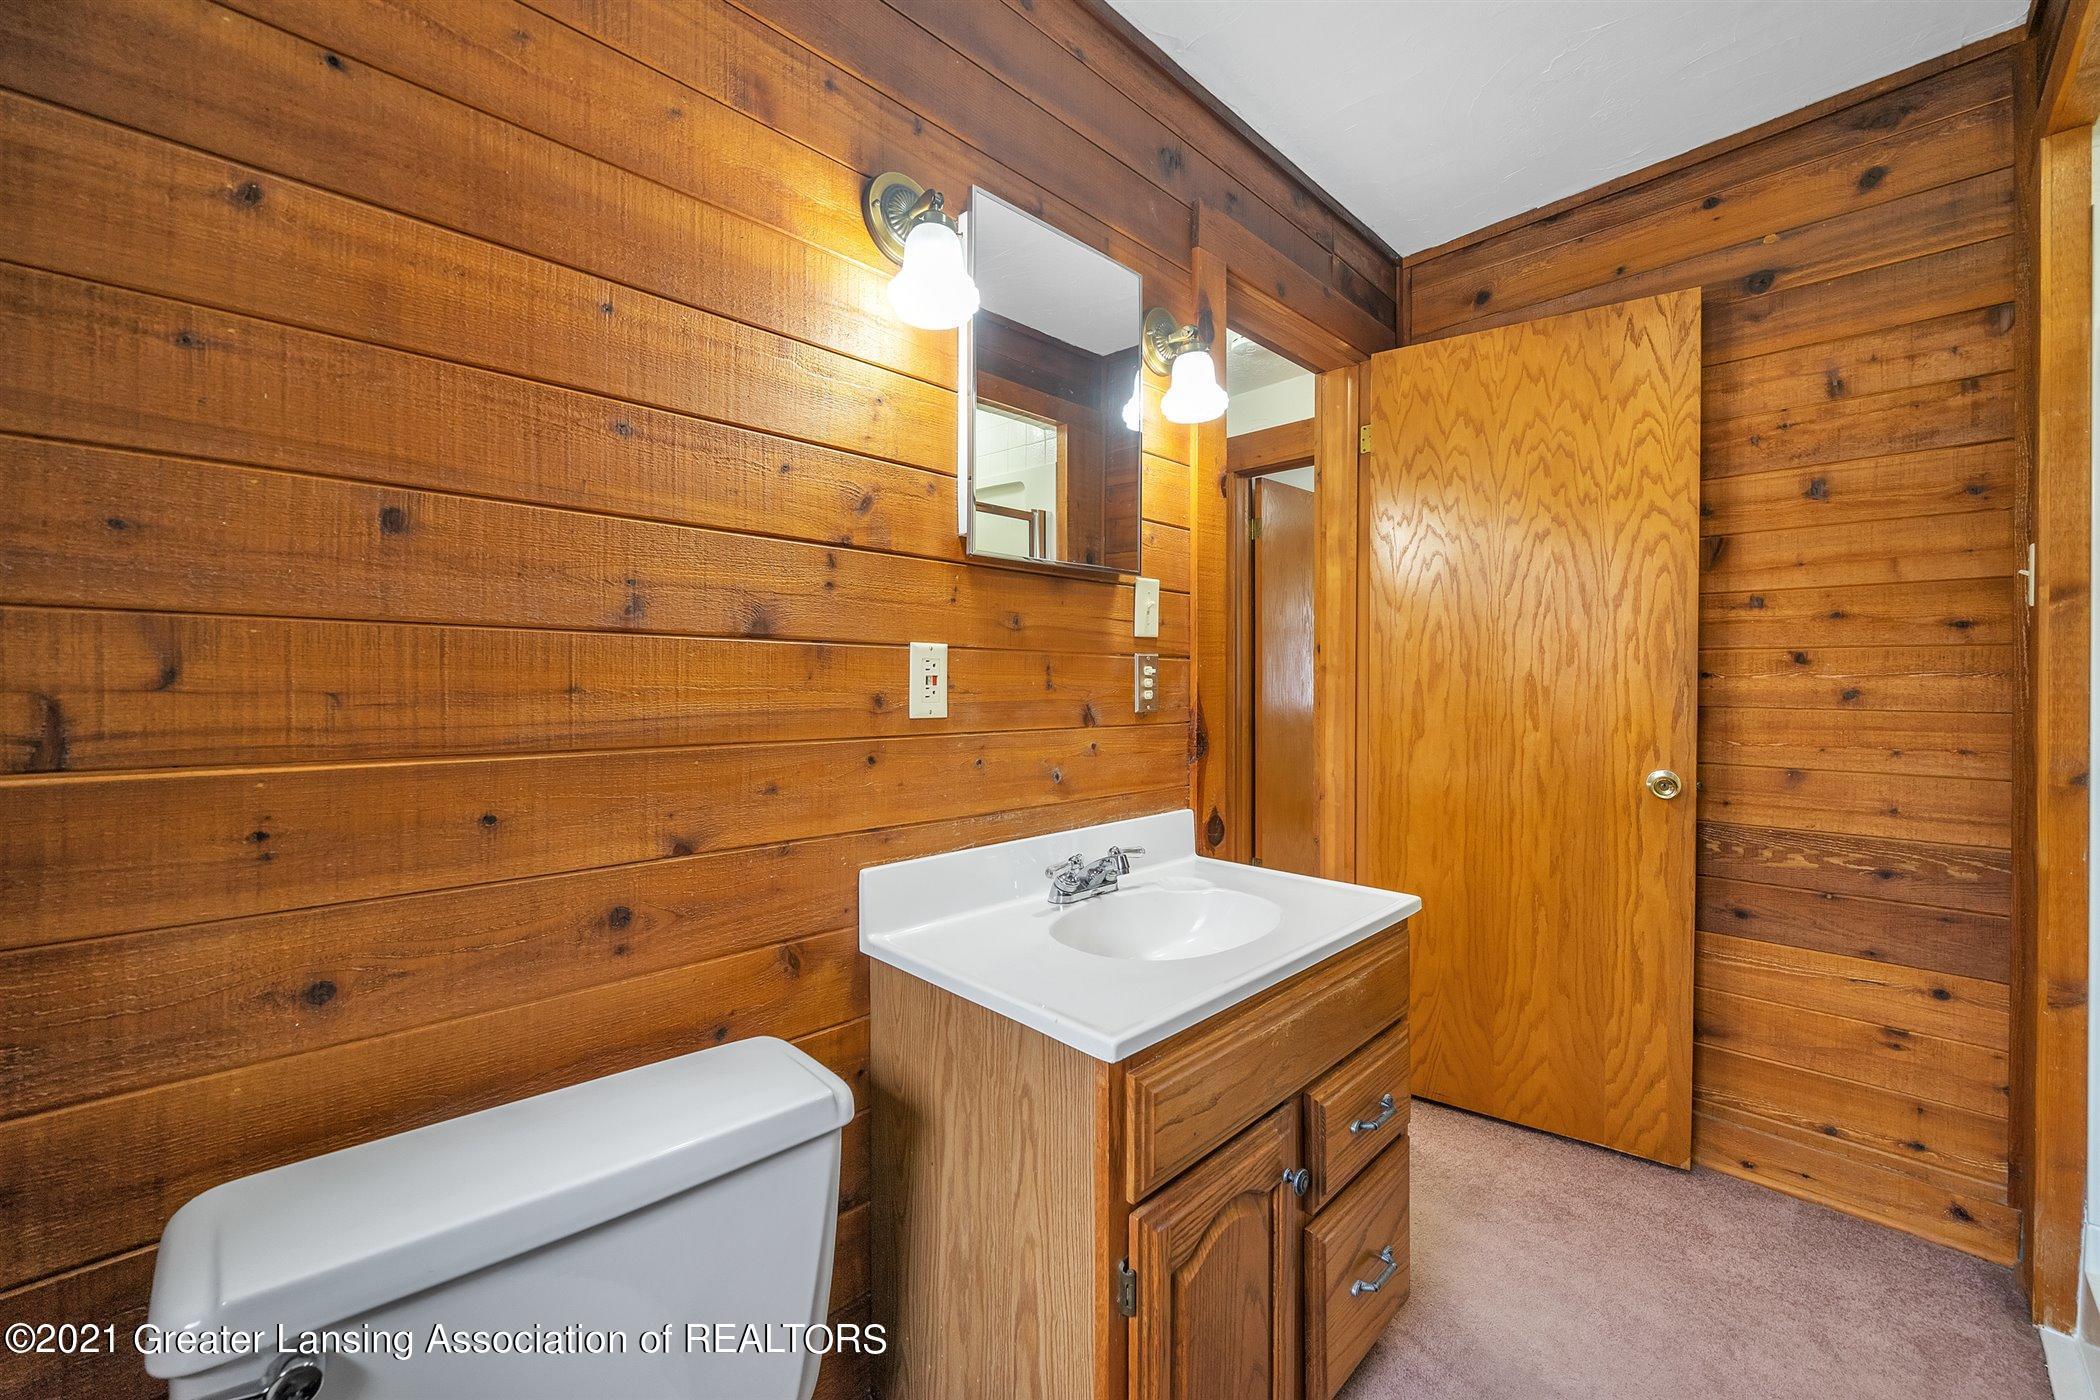 726 N Magnolia Ave - (17) UPPER LEVEL Bathroom - 21